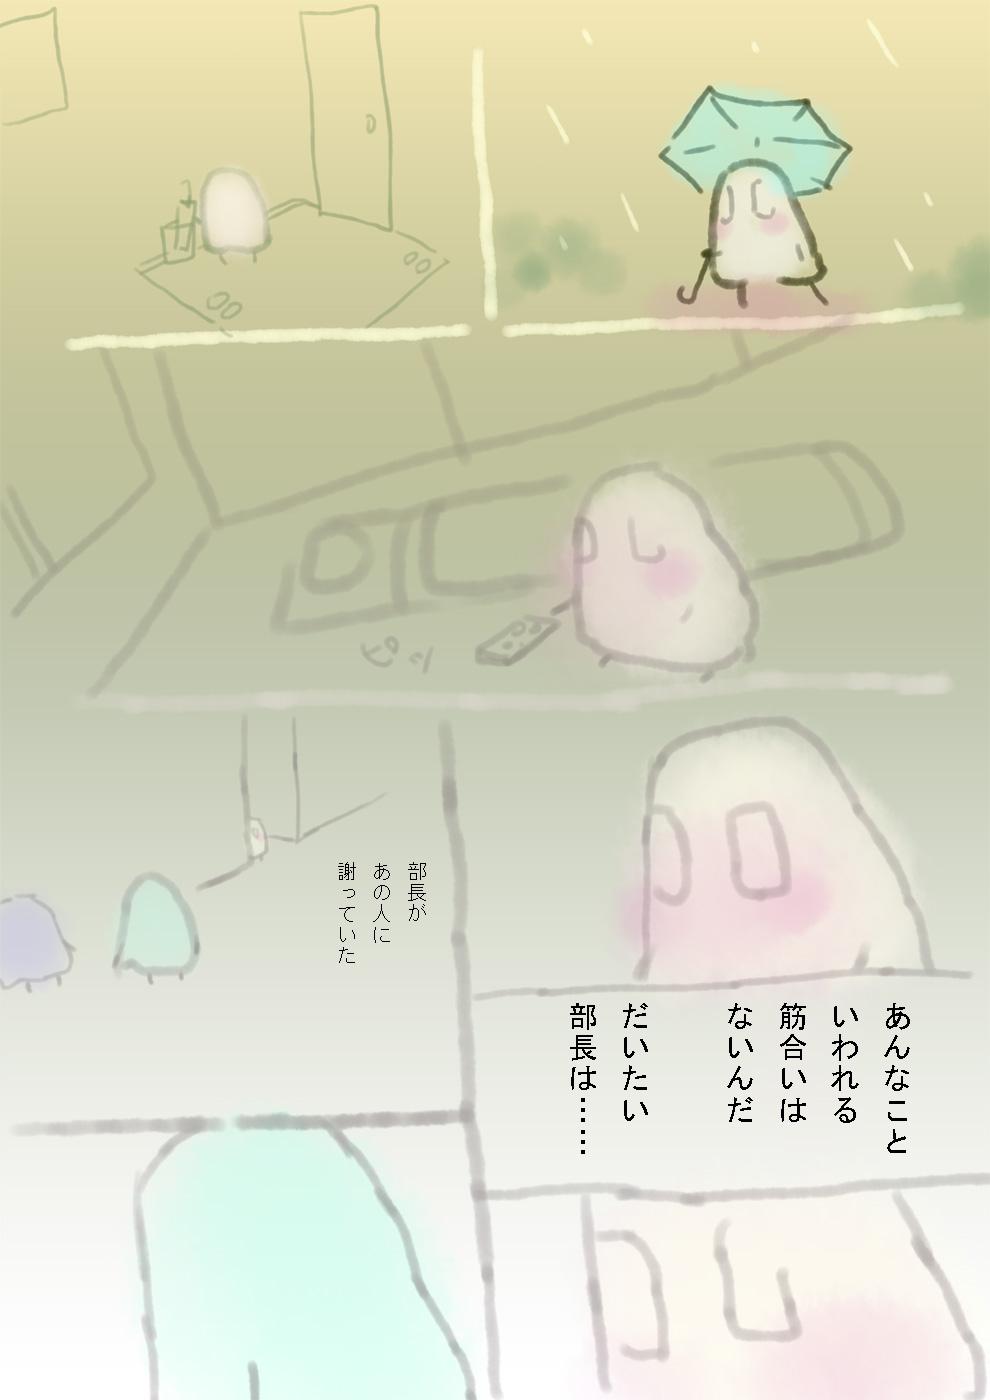 http://ahito.com/comic/short/nega/img/2018/20180604/01.jpg